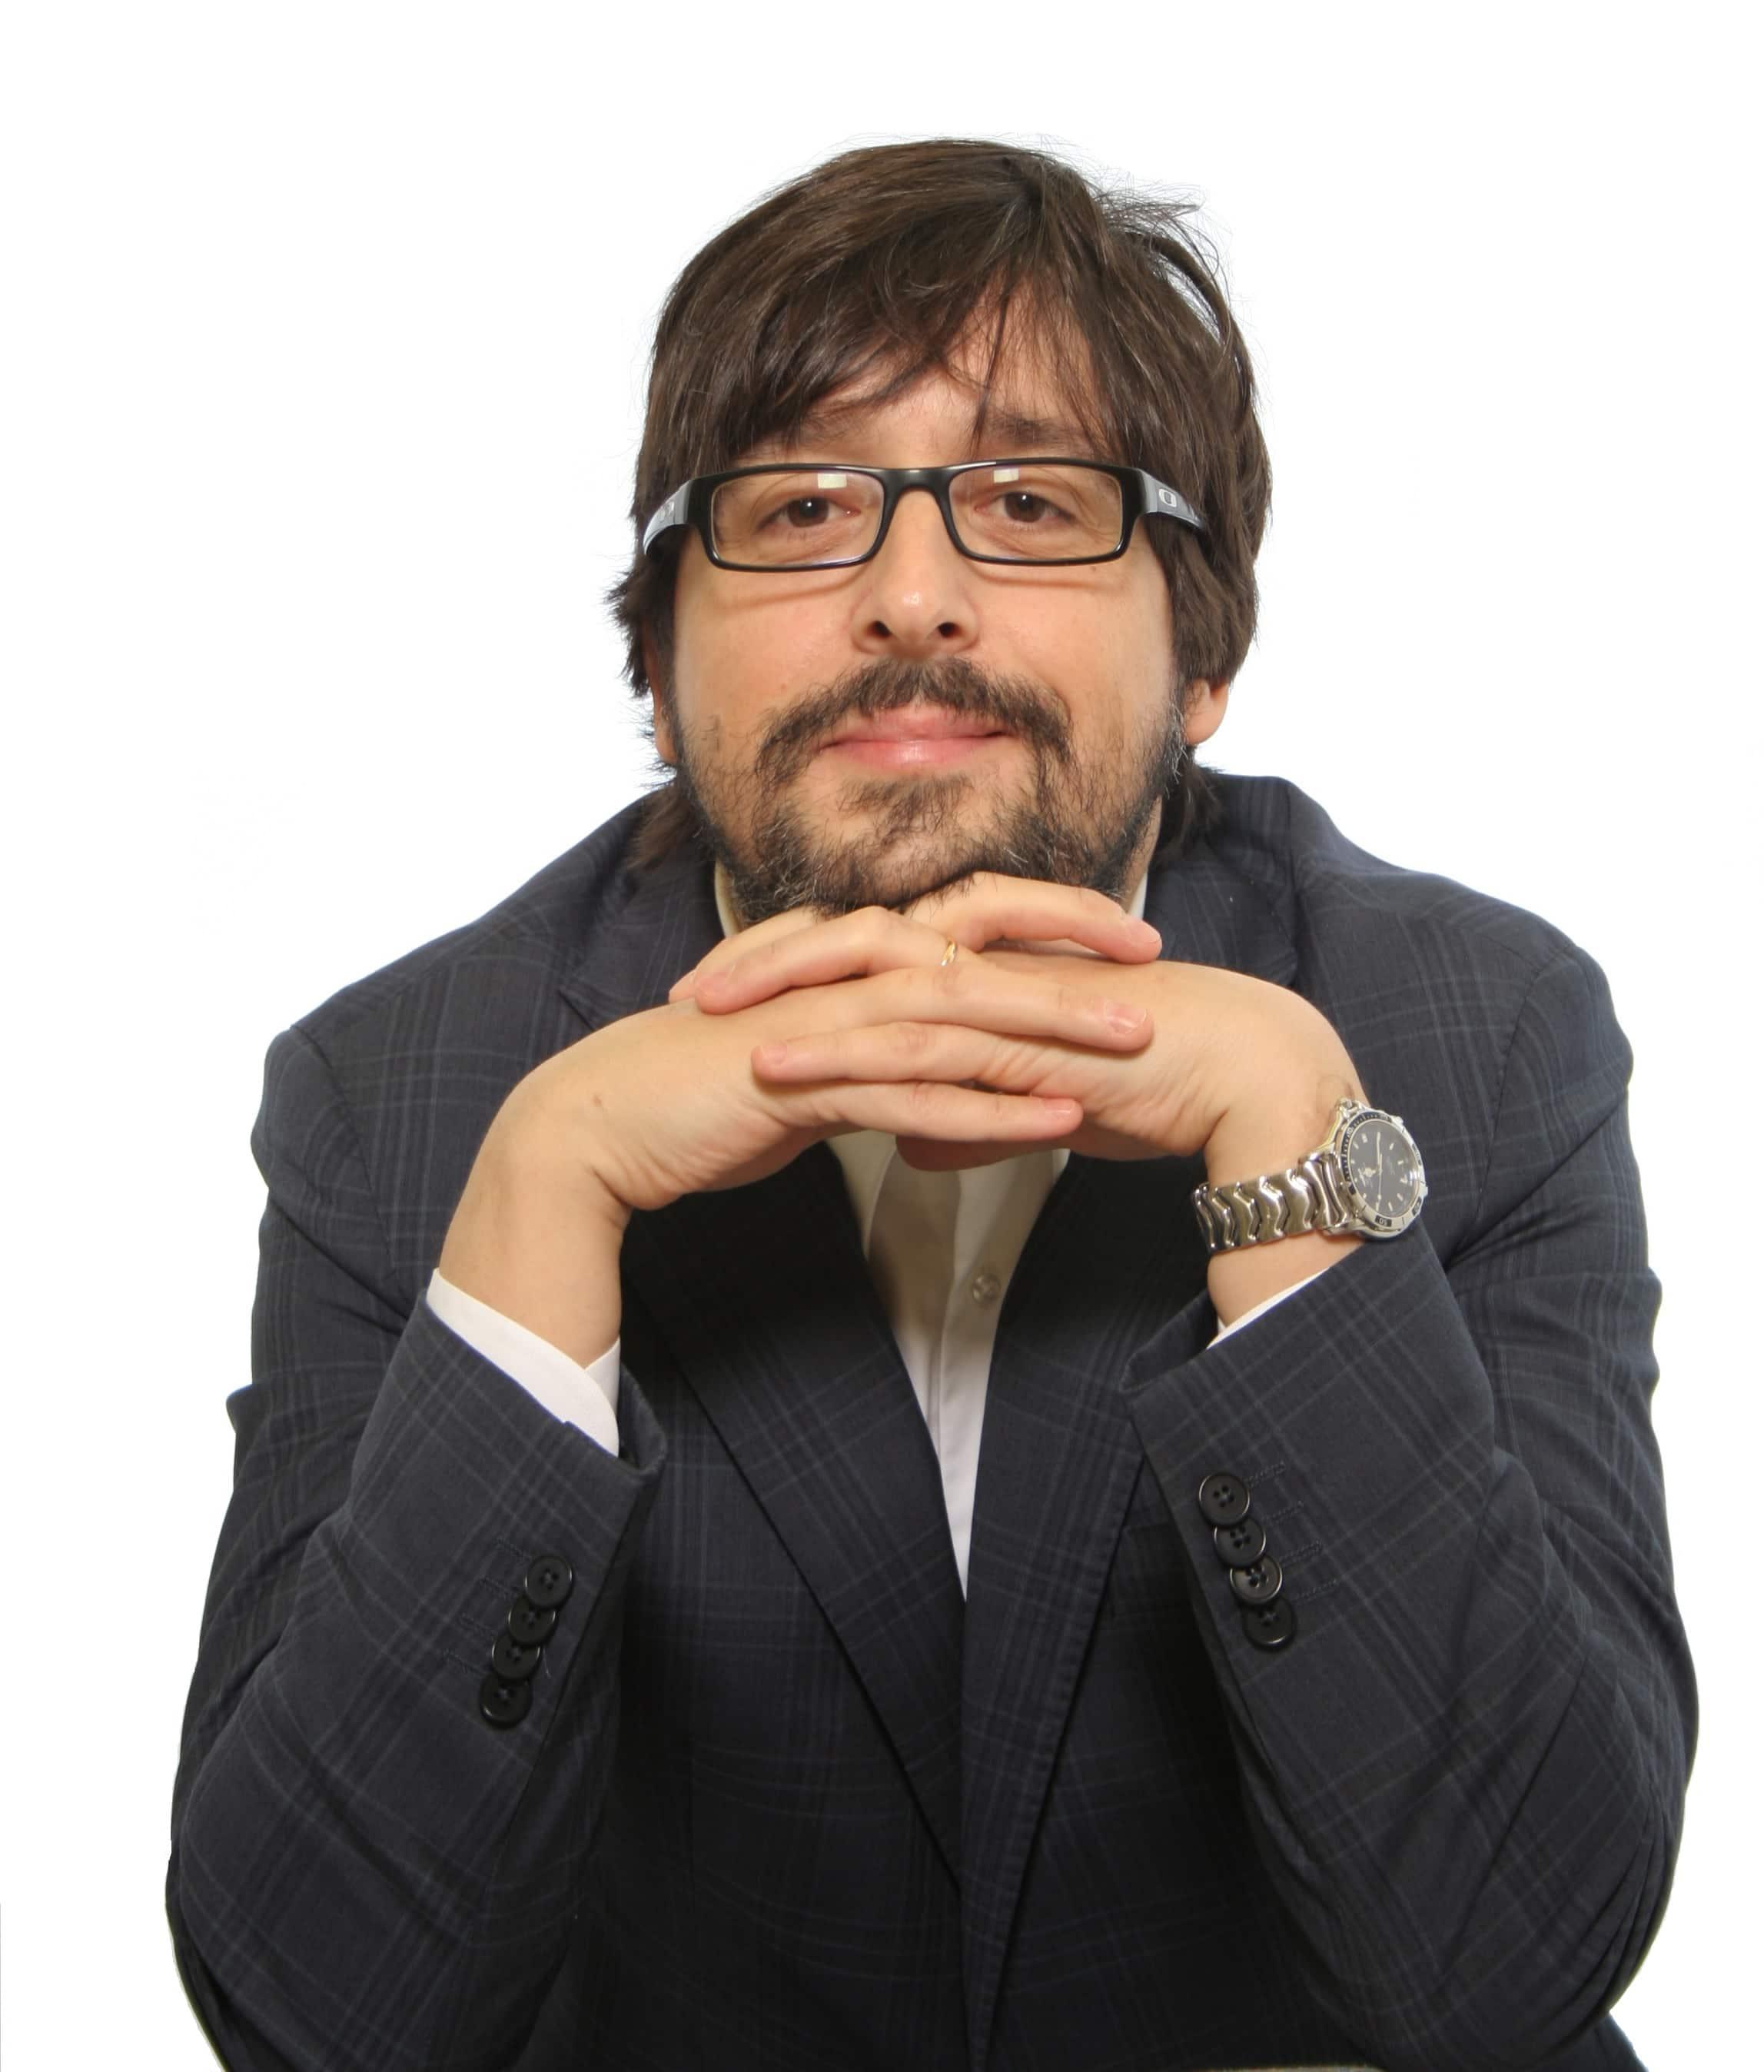 Studio Psicologo Roma Dottor Luca Saita